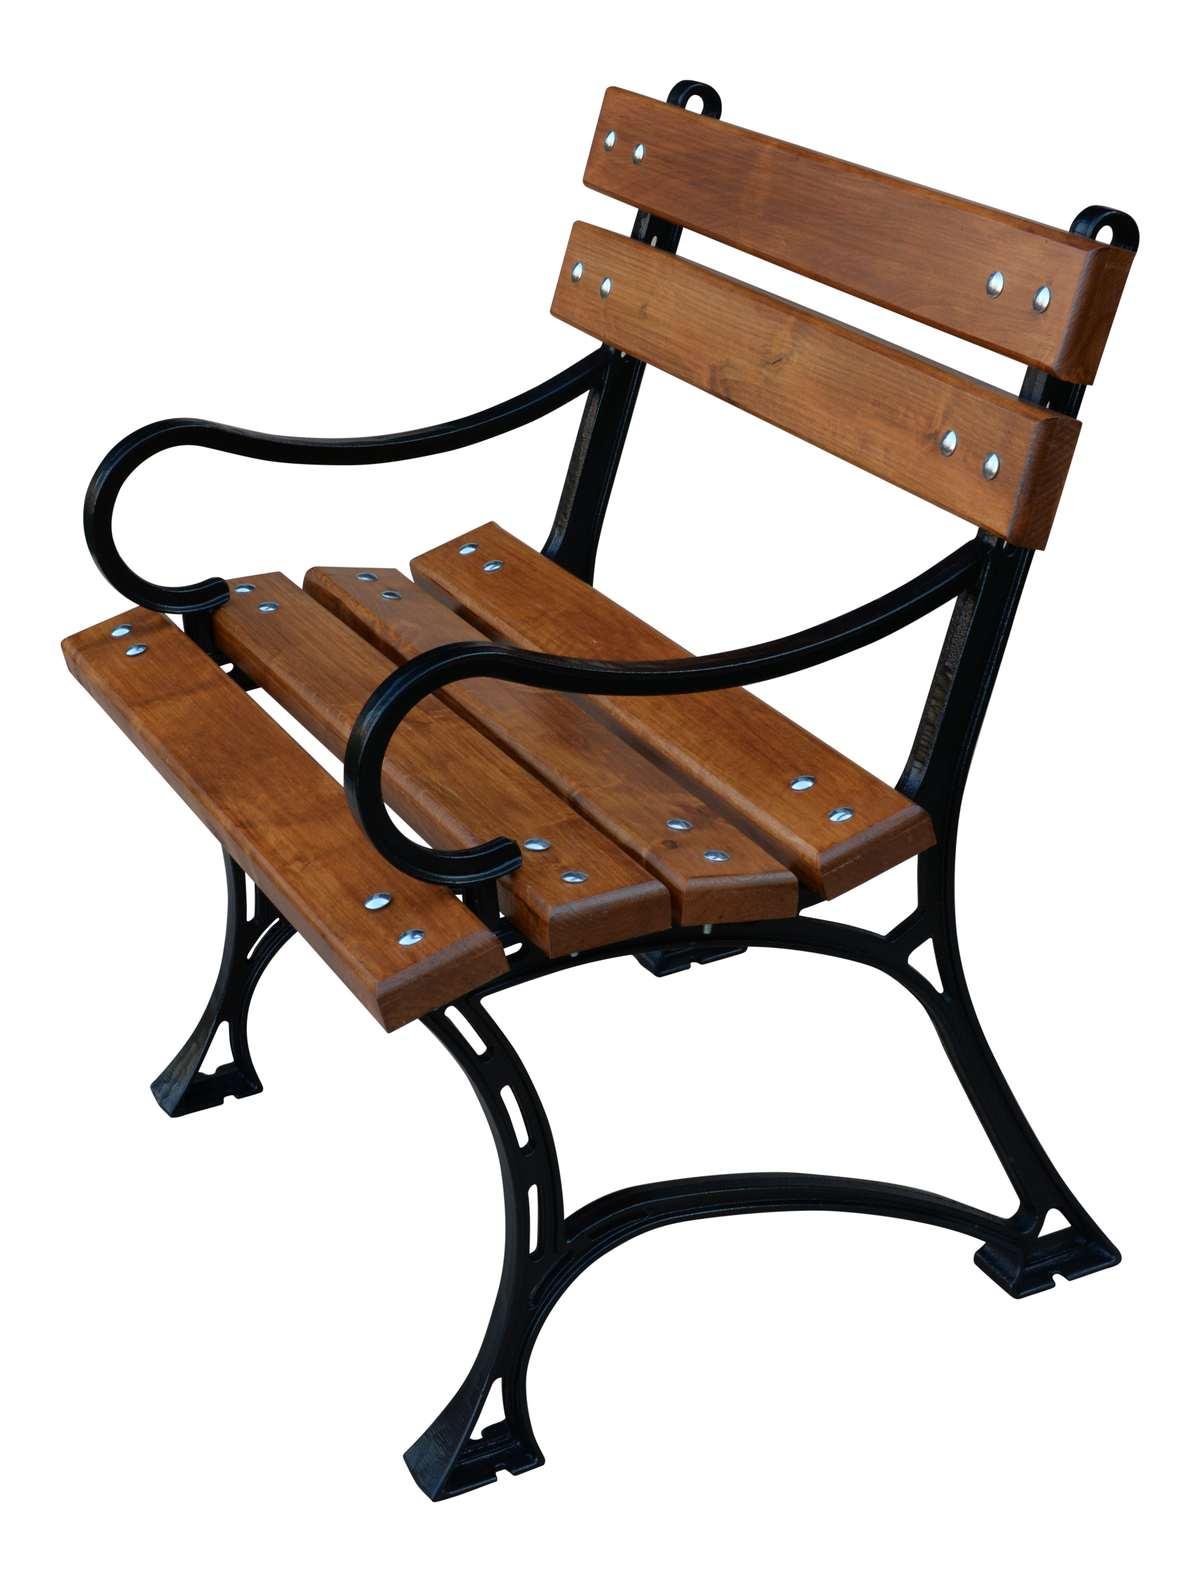 krzeslo ogrodowe